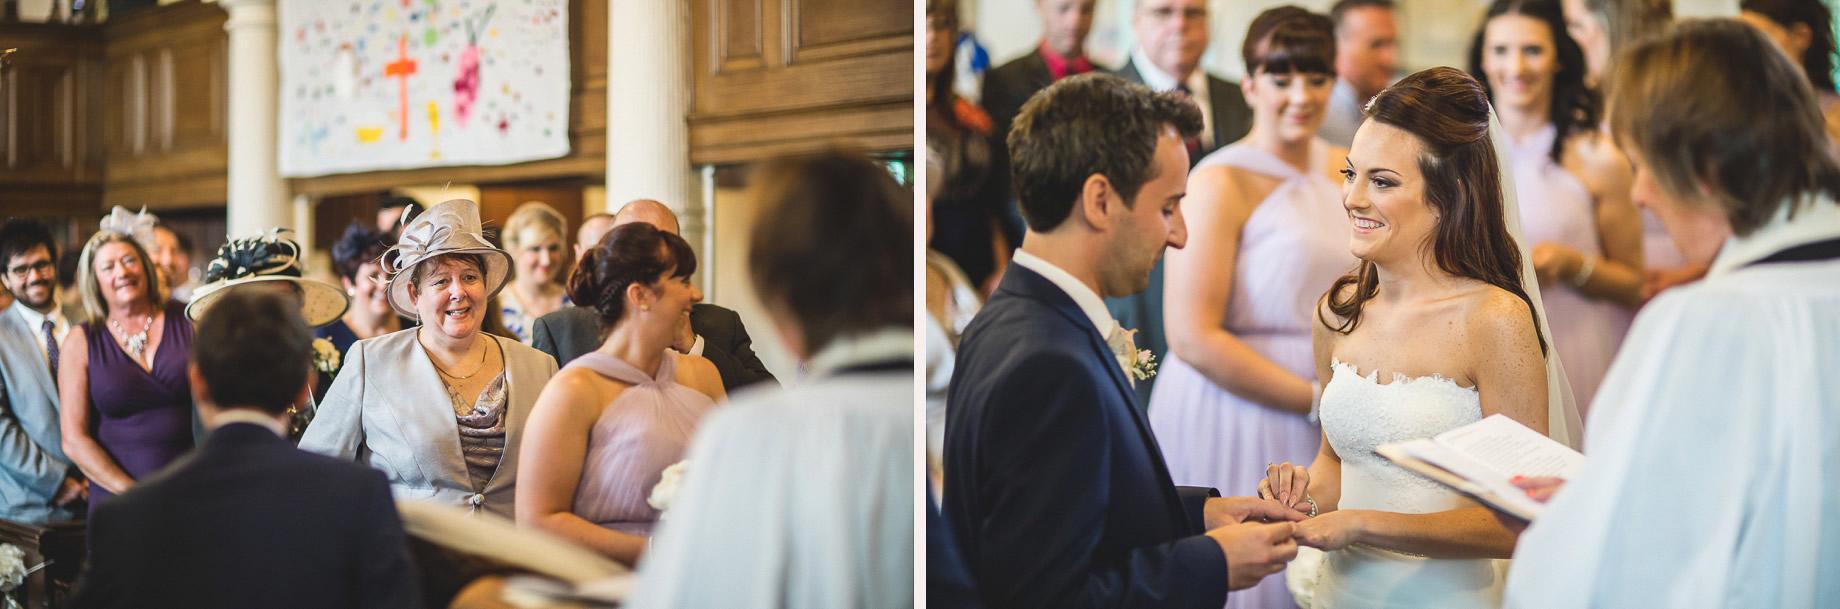 Helen and Matt's Wedding at Mitton Hall 044